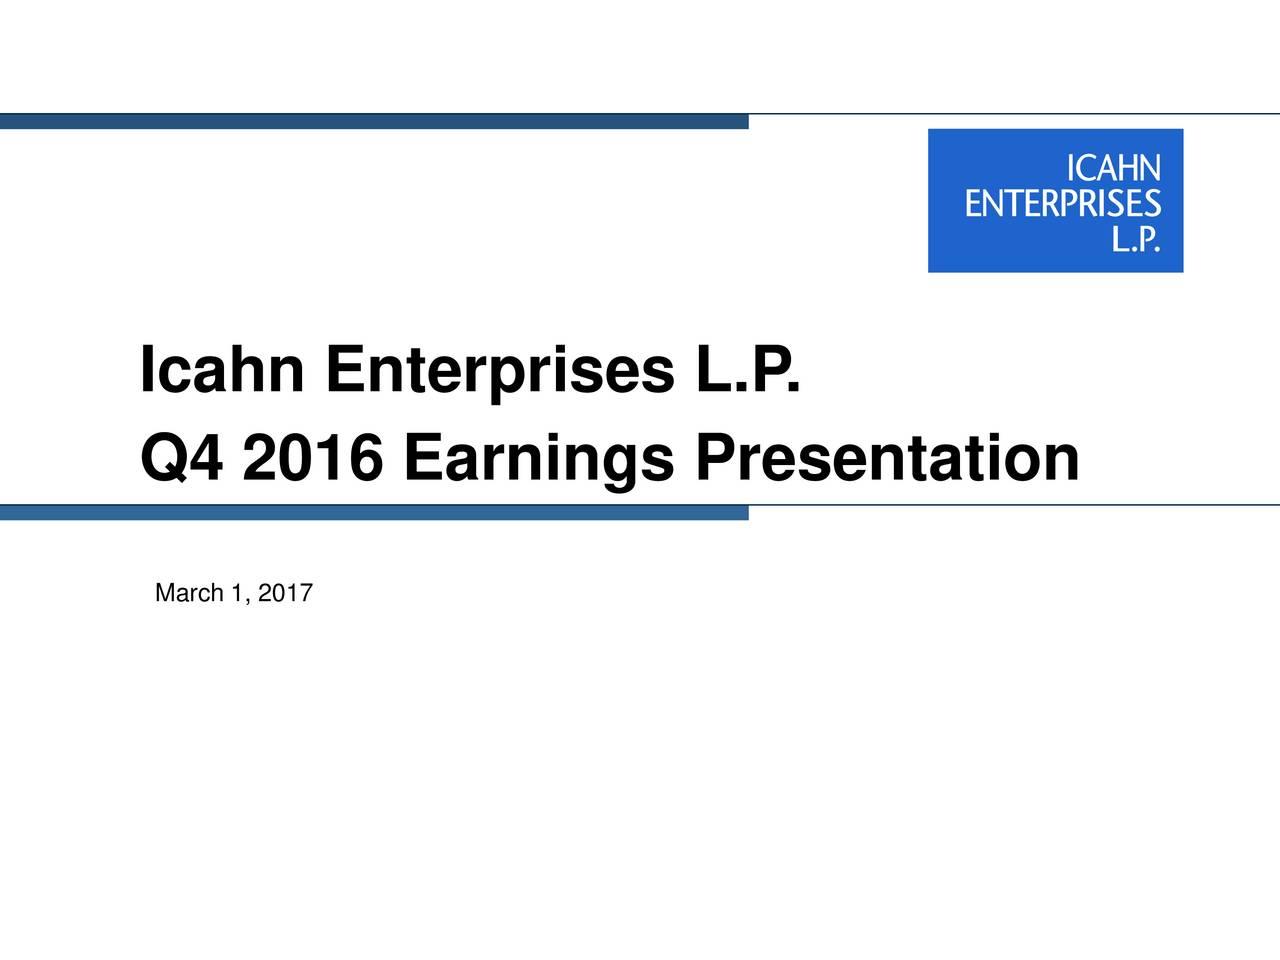 Q4 2016 Earnings Presentation March 1, 2017